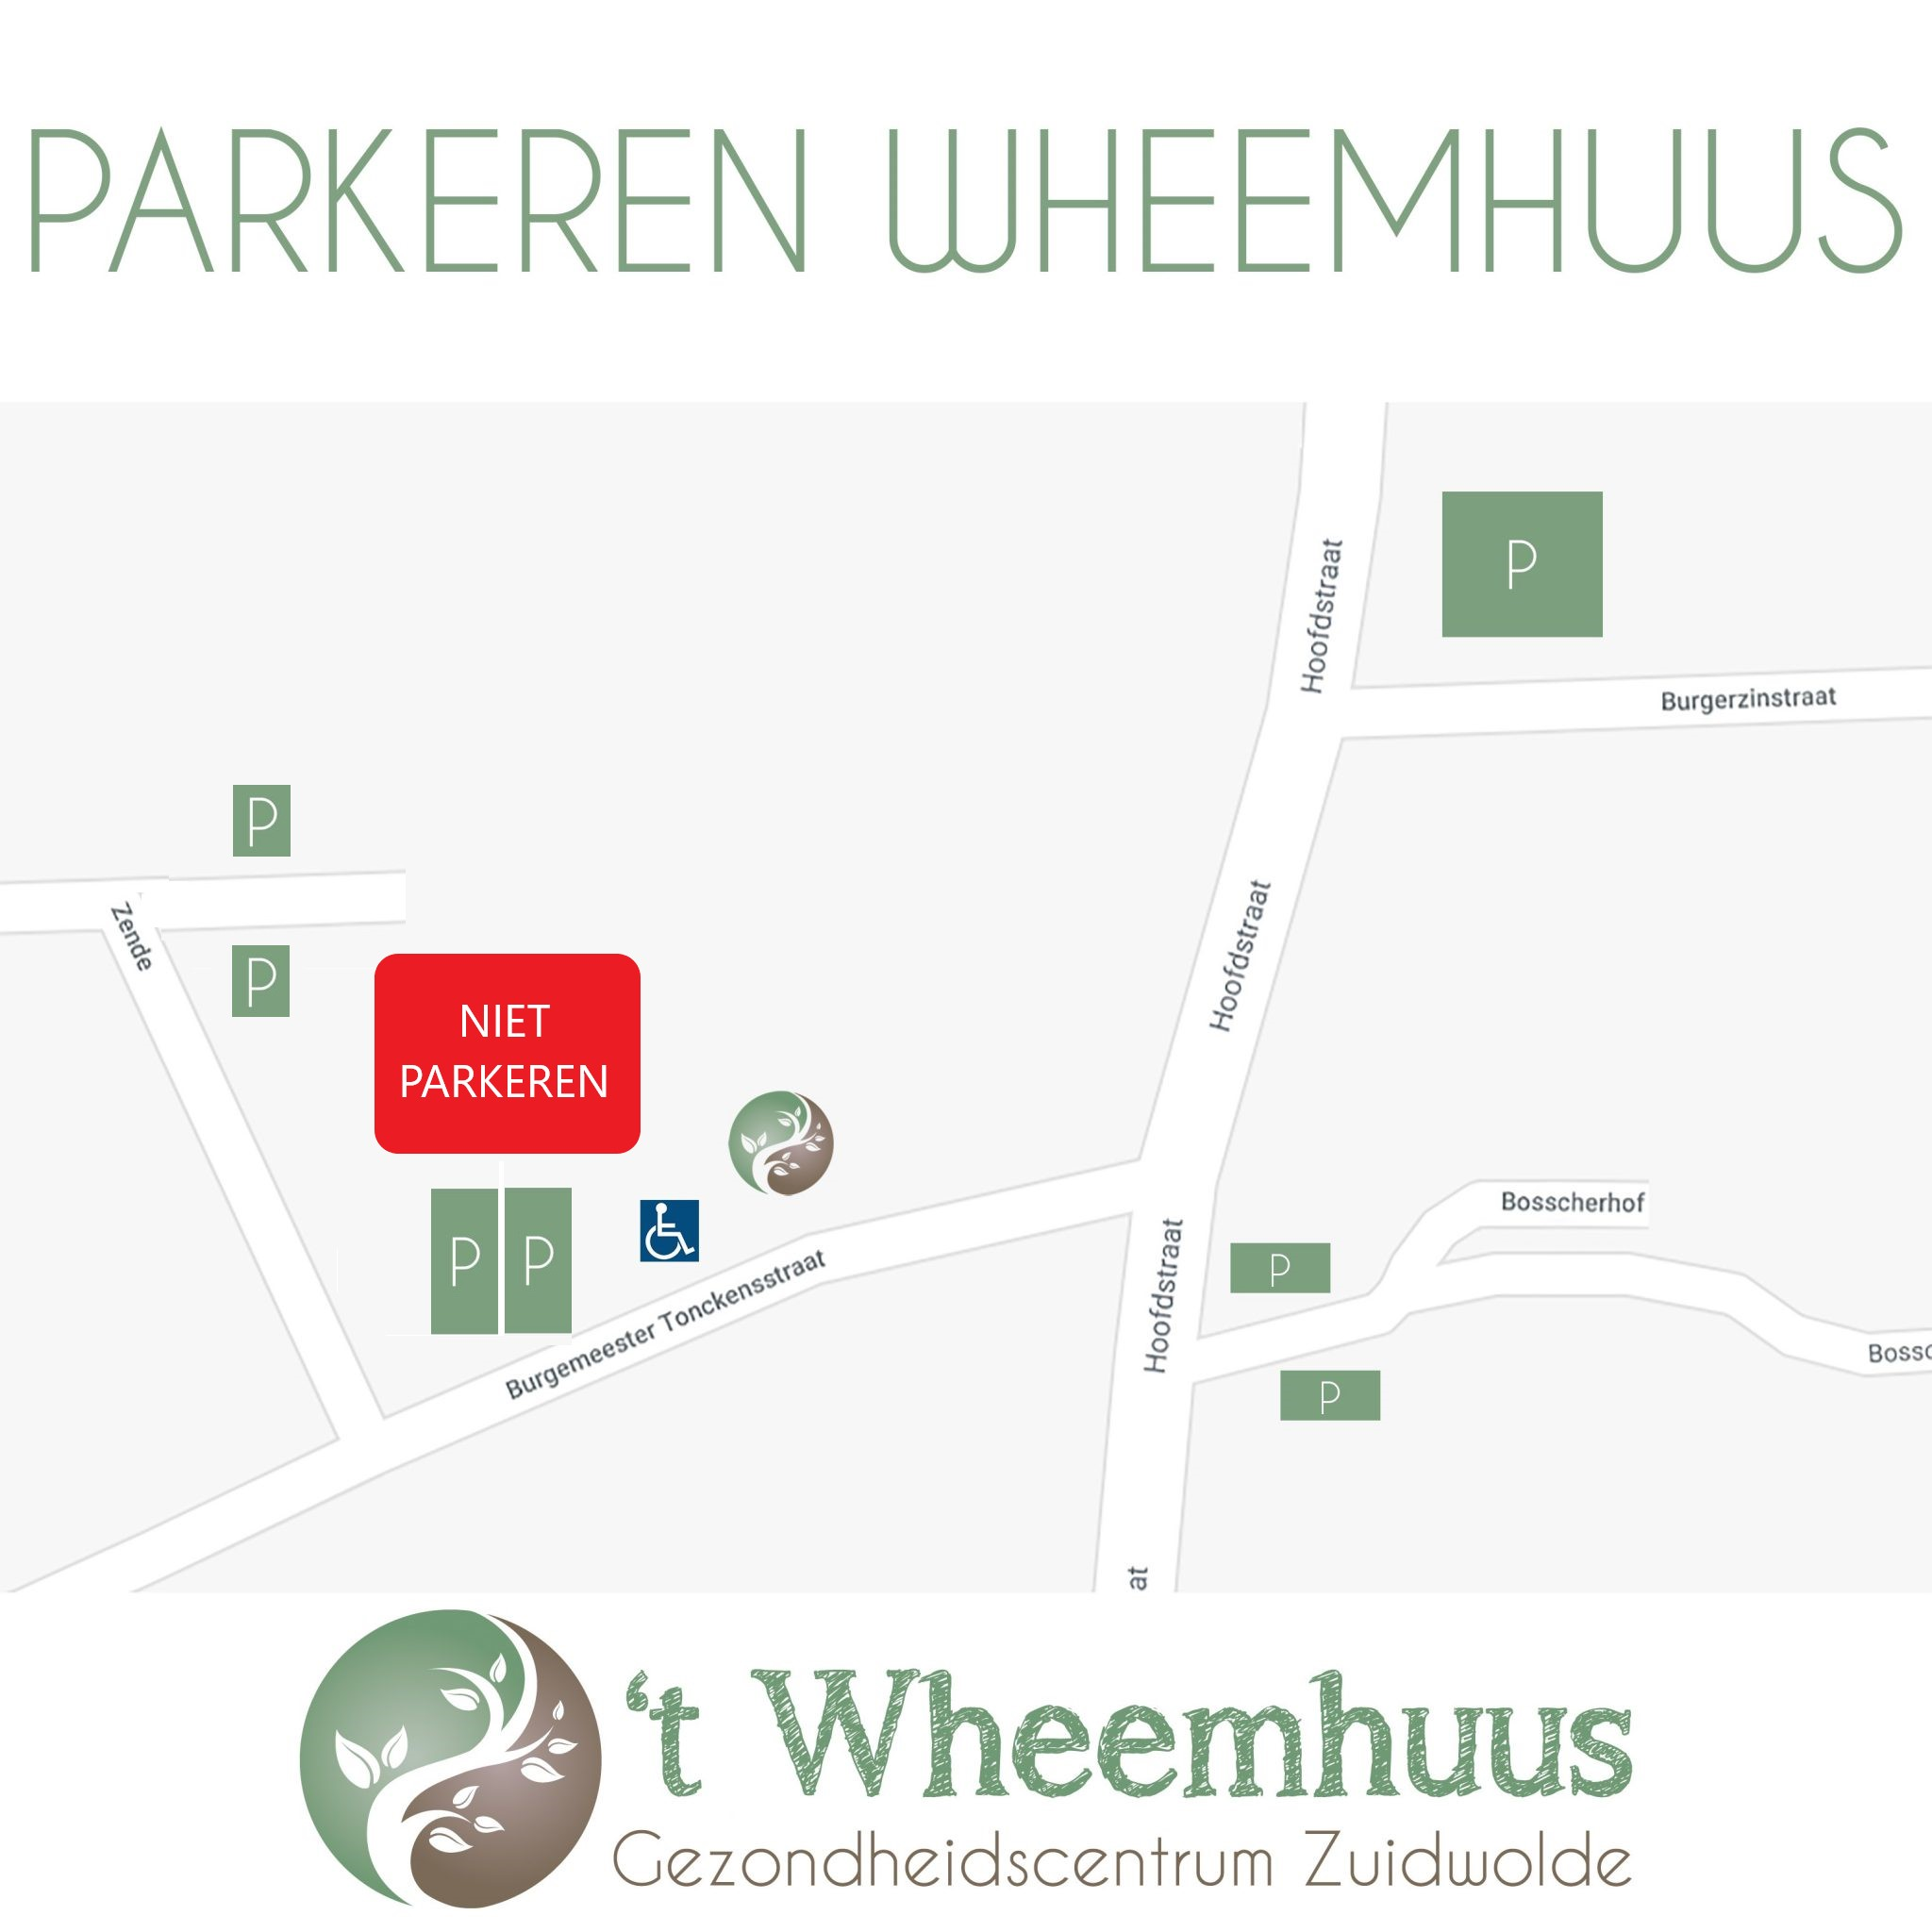 Parkeren 't Wheemhuus Zuidwolde